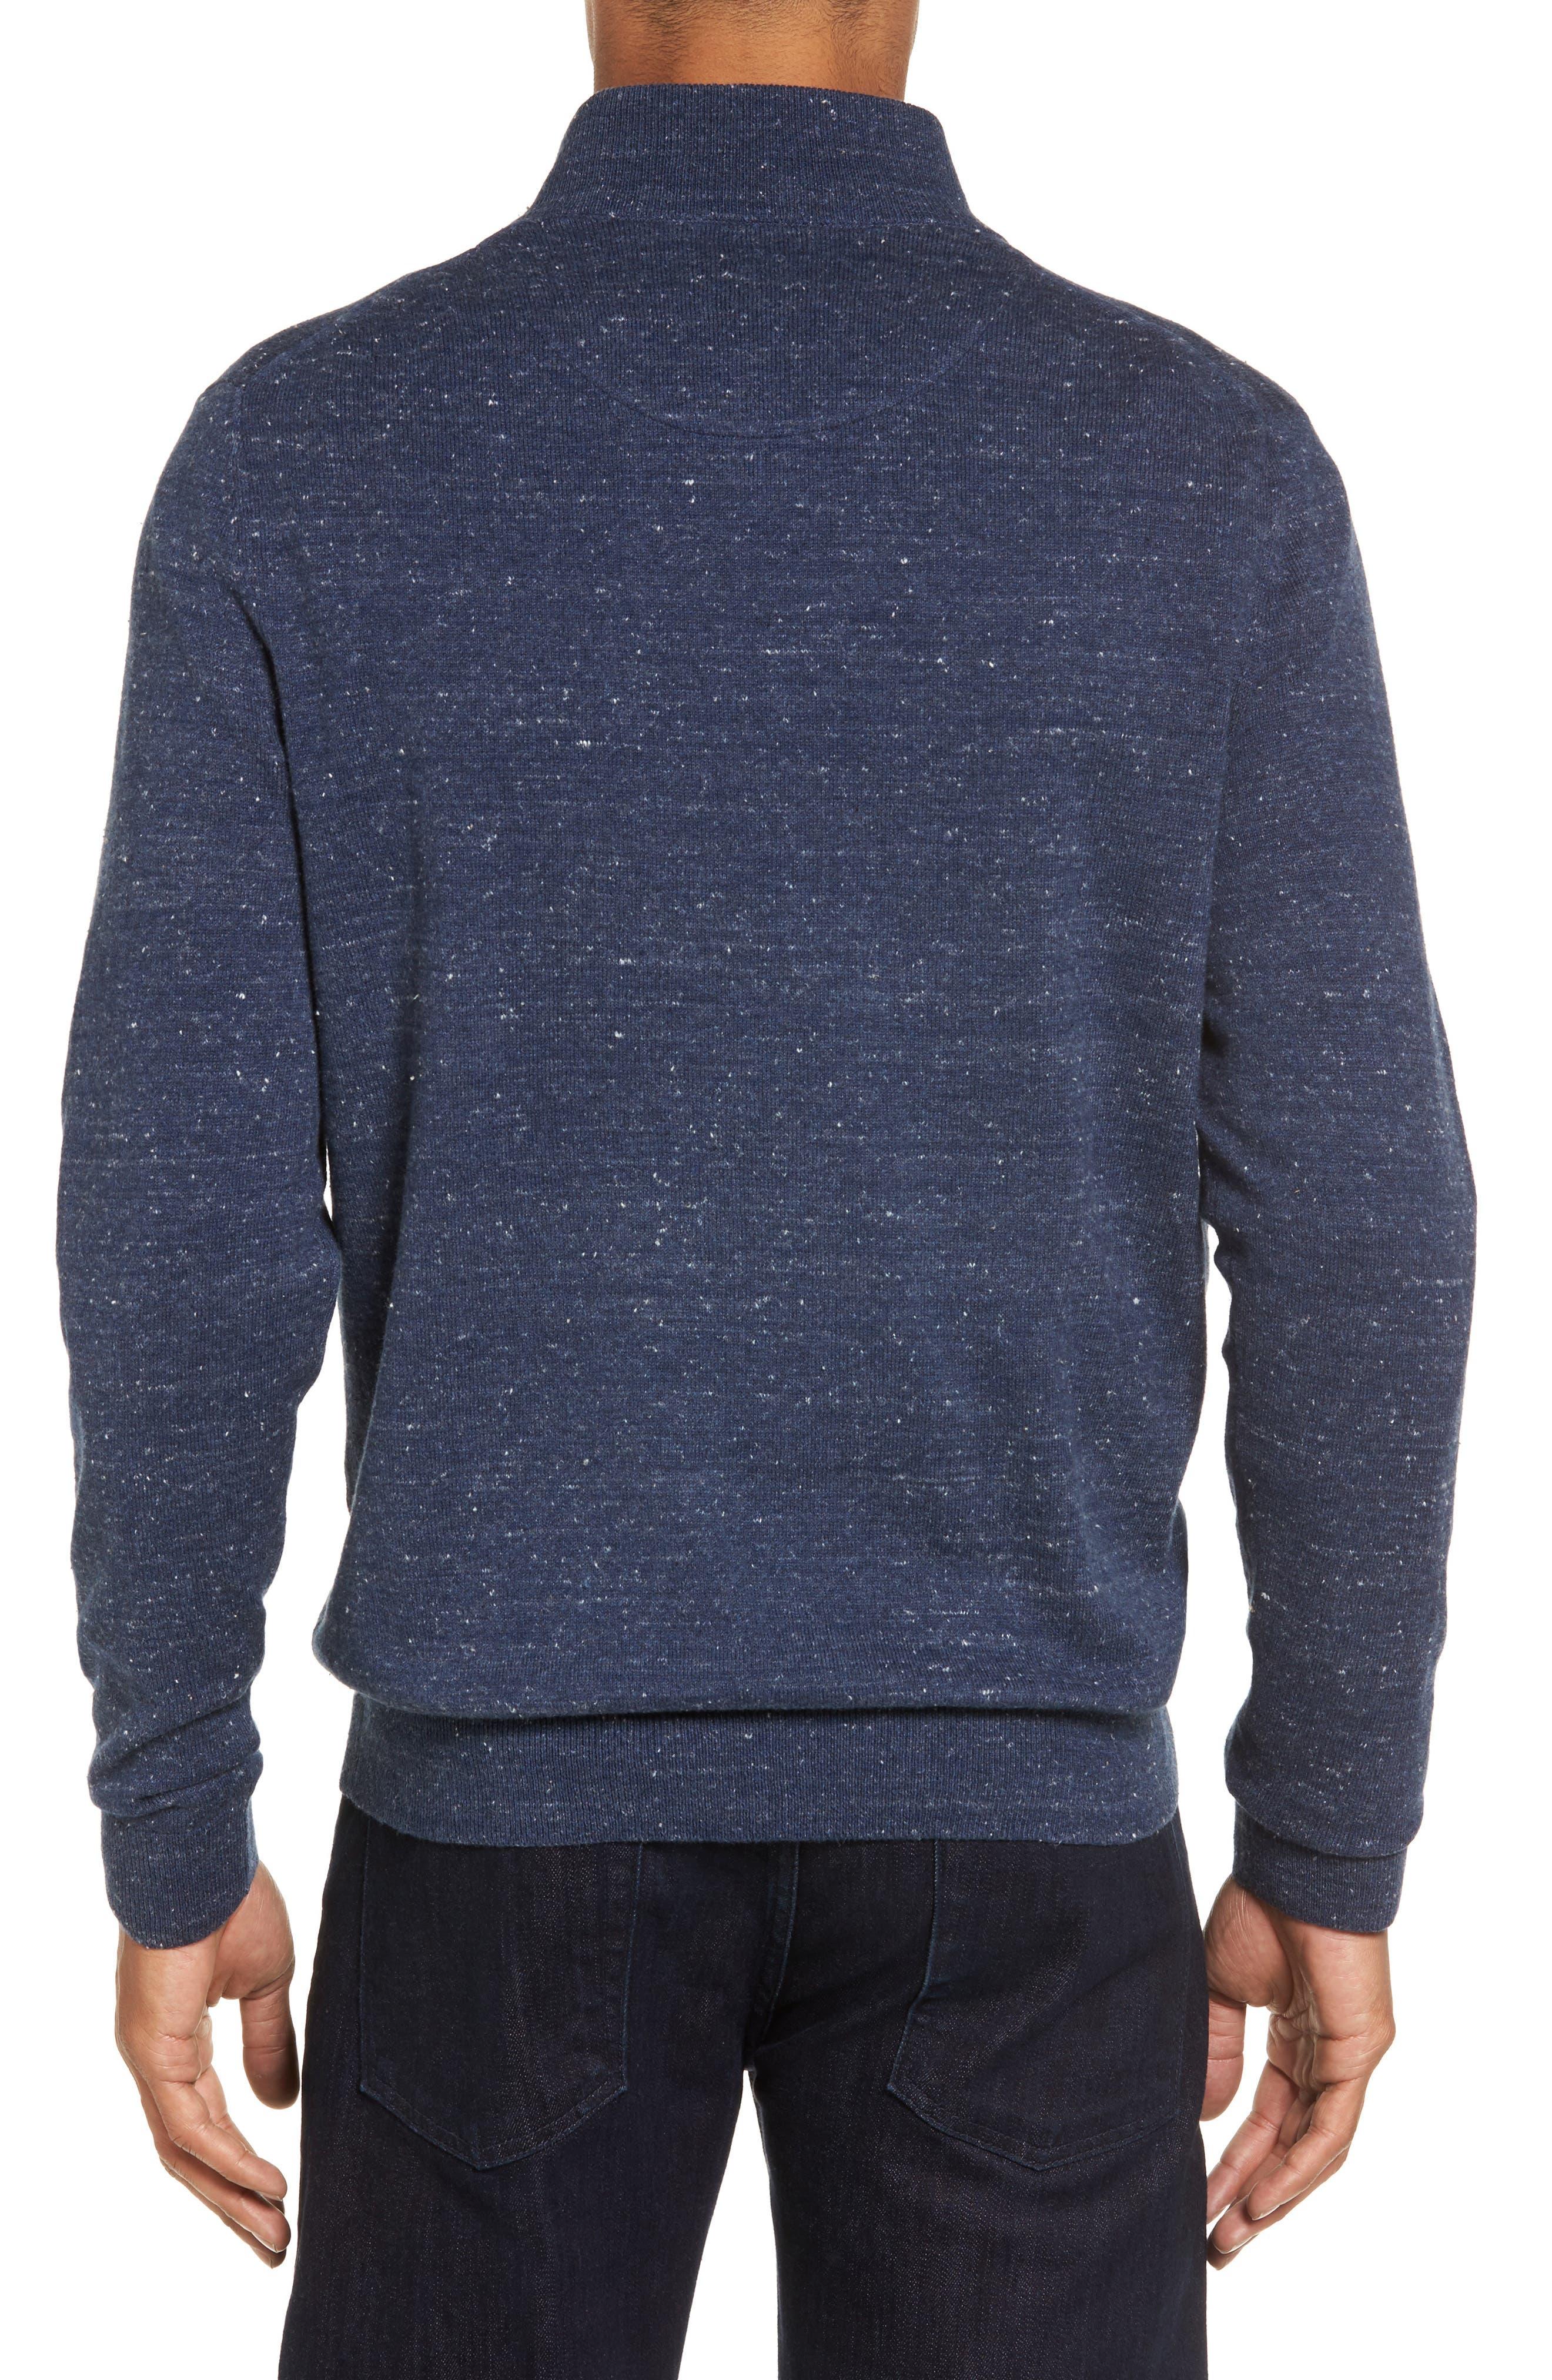 Quarter Zip Sweater,                             Alternate thumbnail 2, color,                             Blue Twilight Marl